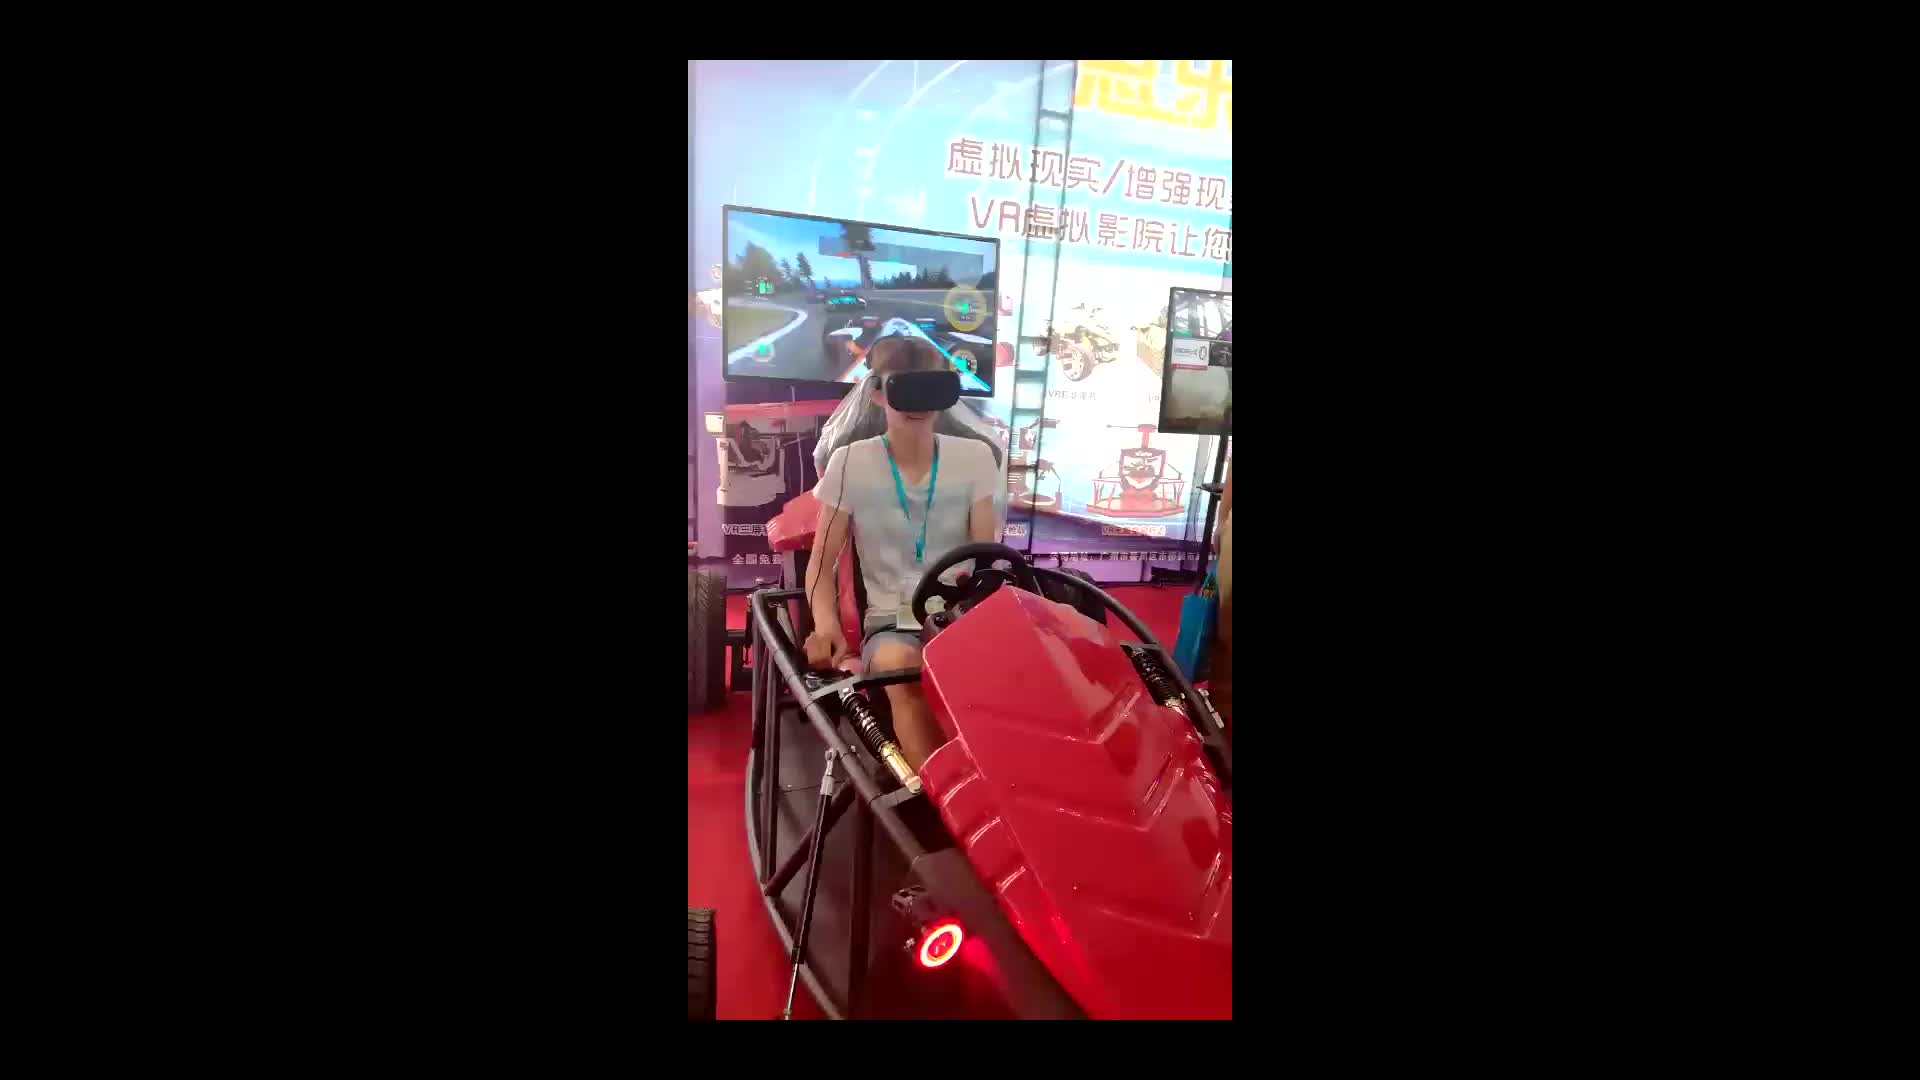 Máquina de jogo de simulador de VR vr dirigindo corrida simulador motion playseat f1